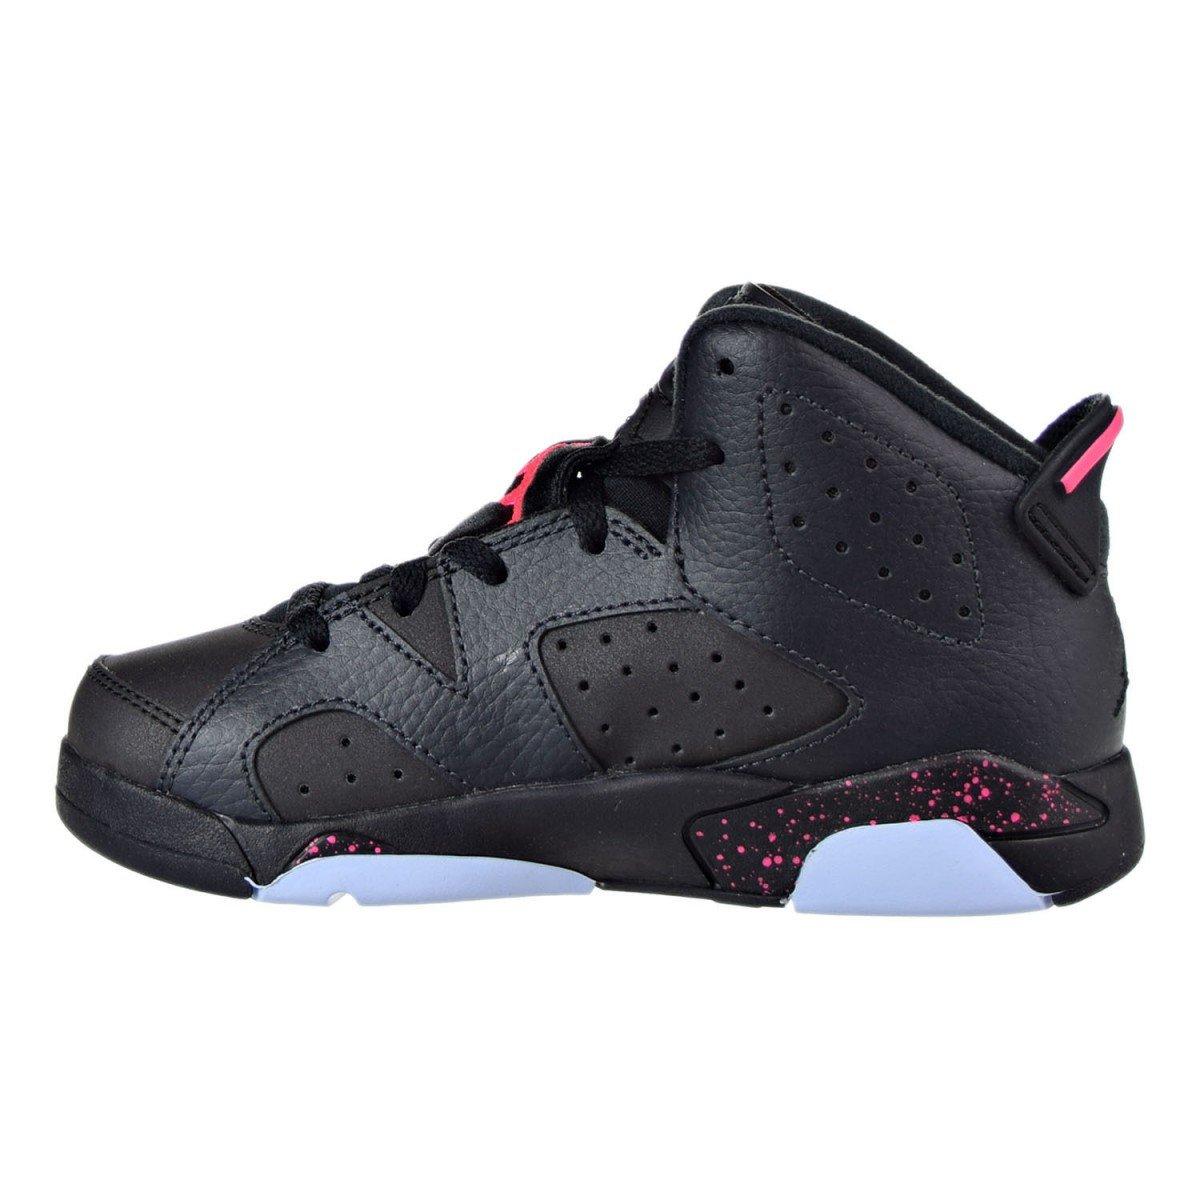 Air Jordan Little Kids Retro 6 Anthracite/Black/Hyper Pink/Black (3)